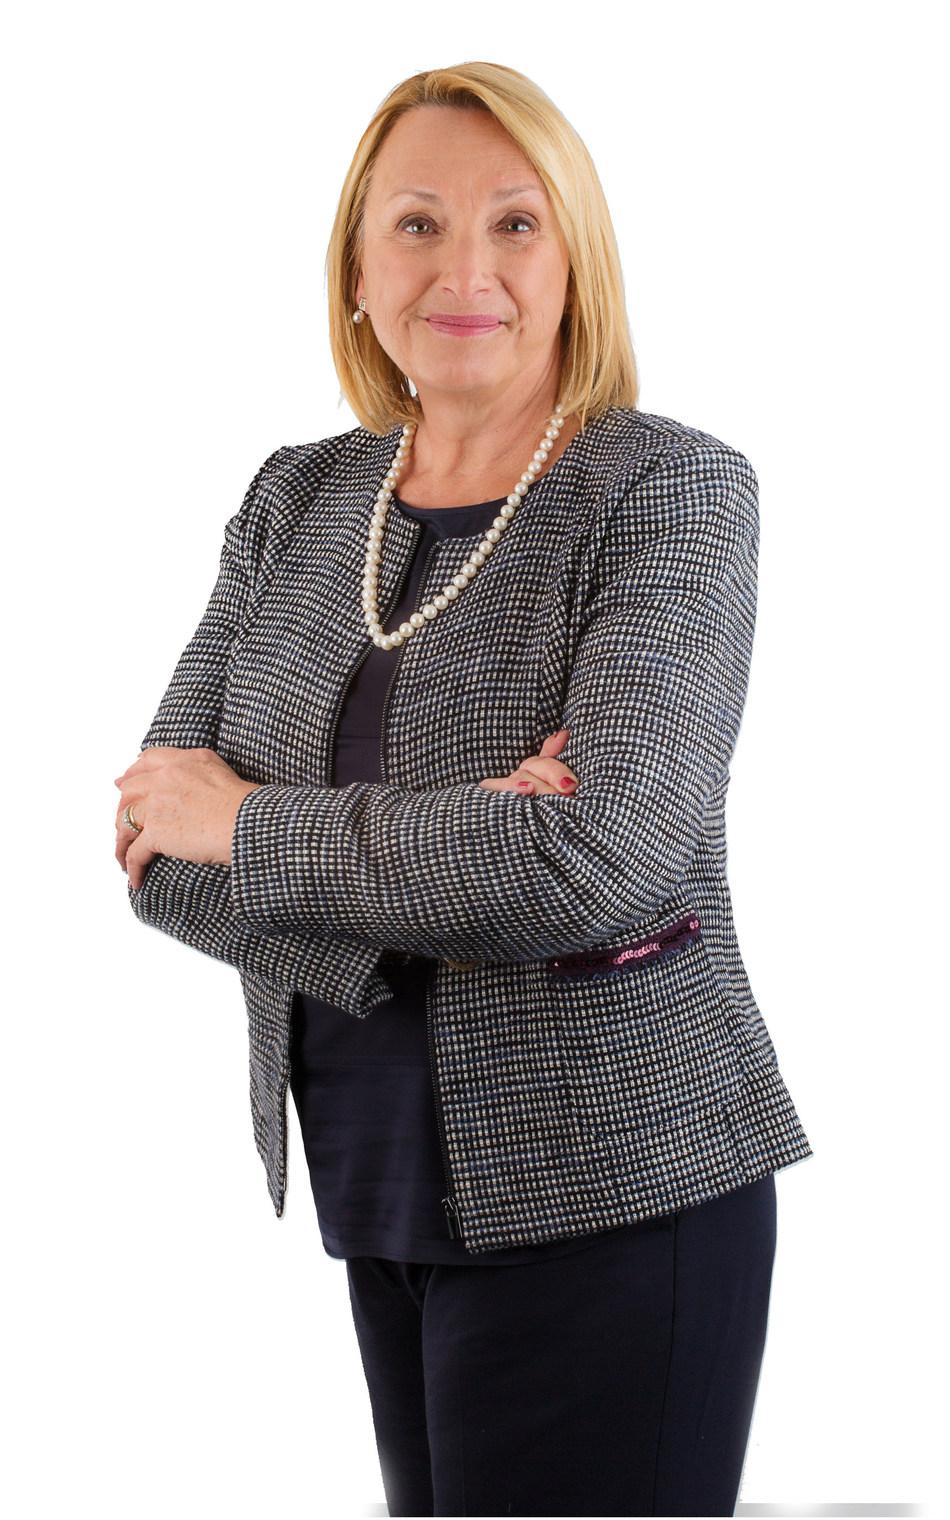 Maureen Jensen, Chair and CEO, Ontario Securities Commission (CNW Group/Ontario Securities Commission)